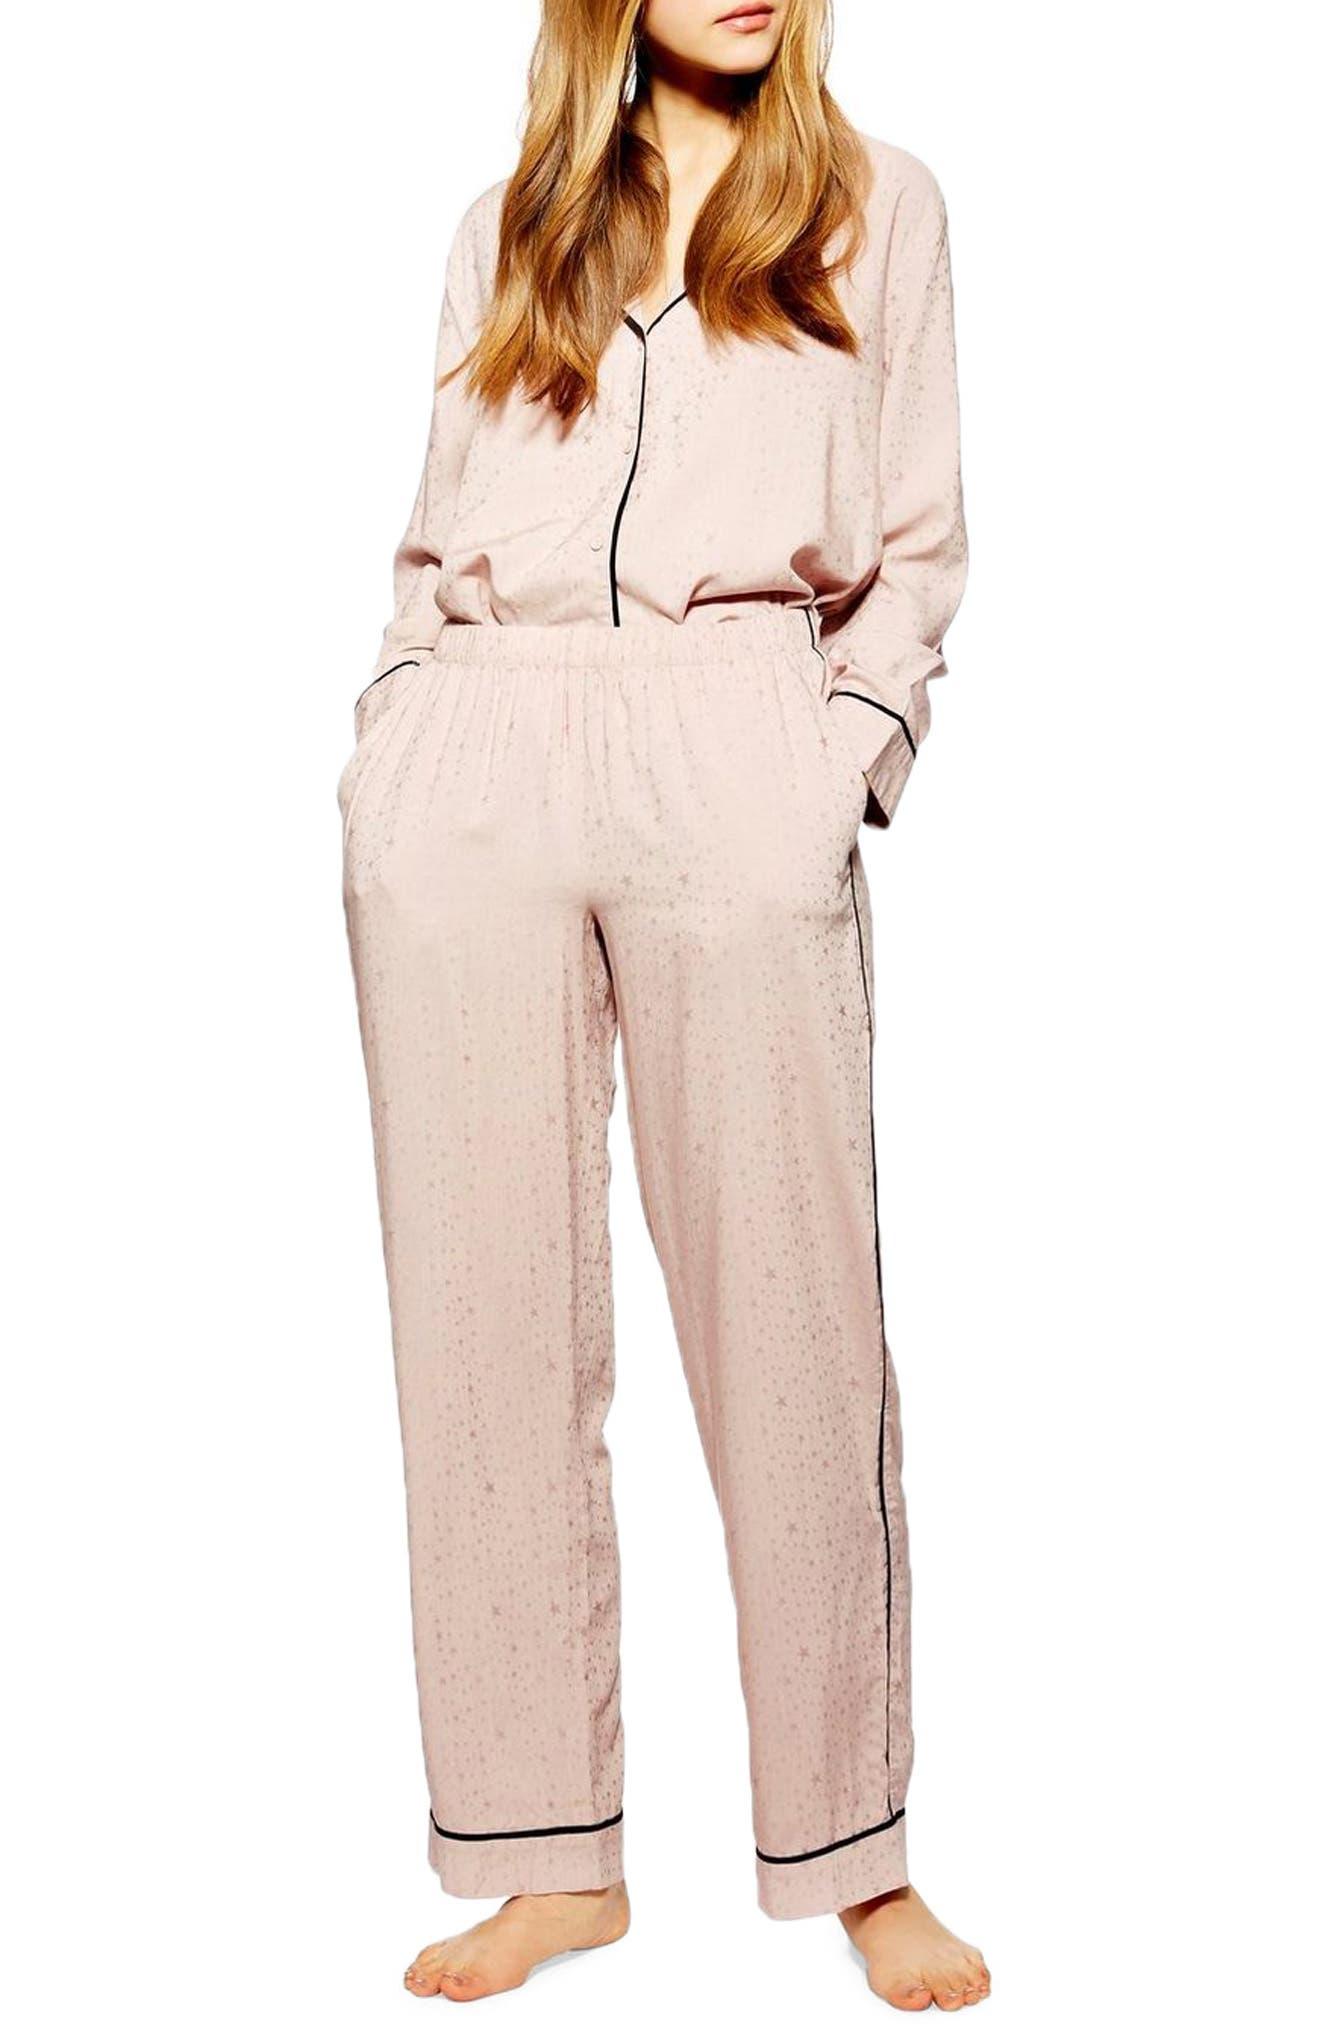 Star Jacquard Pajama Pants,                             Main thumbnail 1, color,                             NUDE MULTI